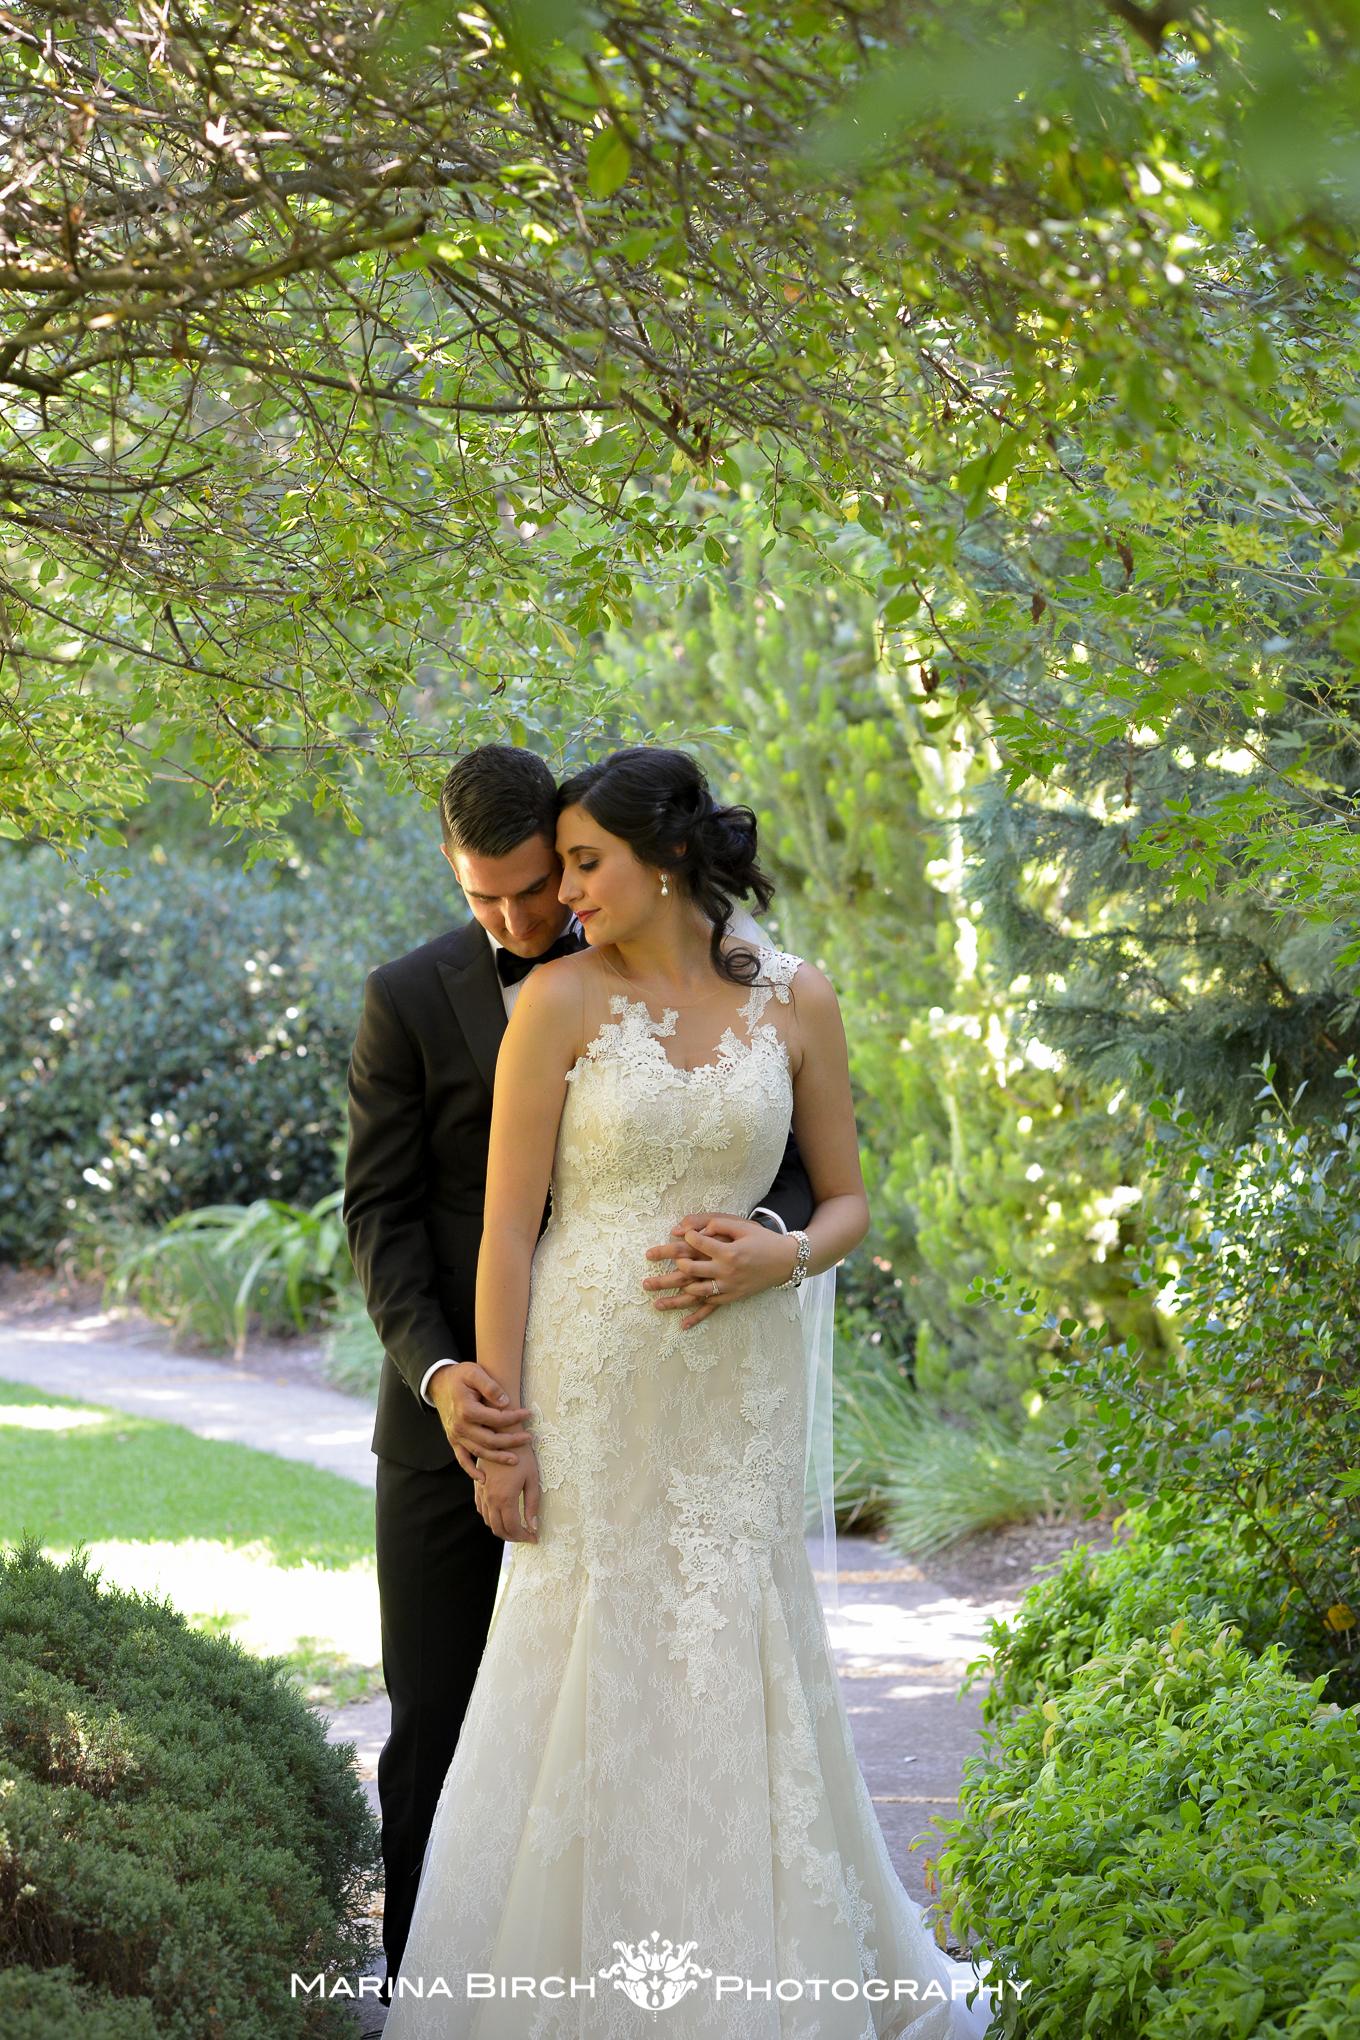 MBP.Lava wedding -20.jpg